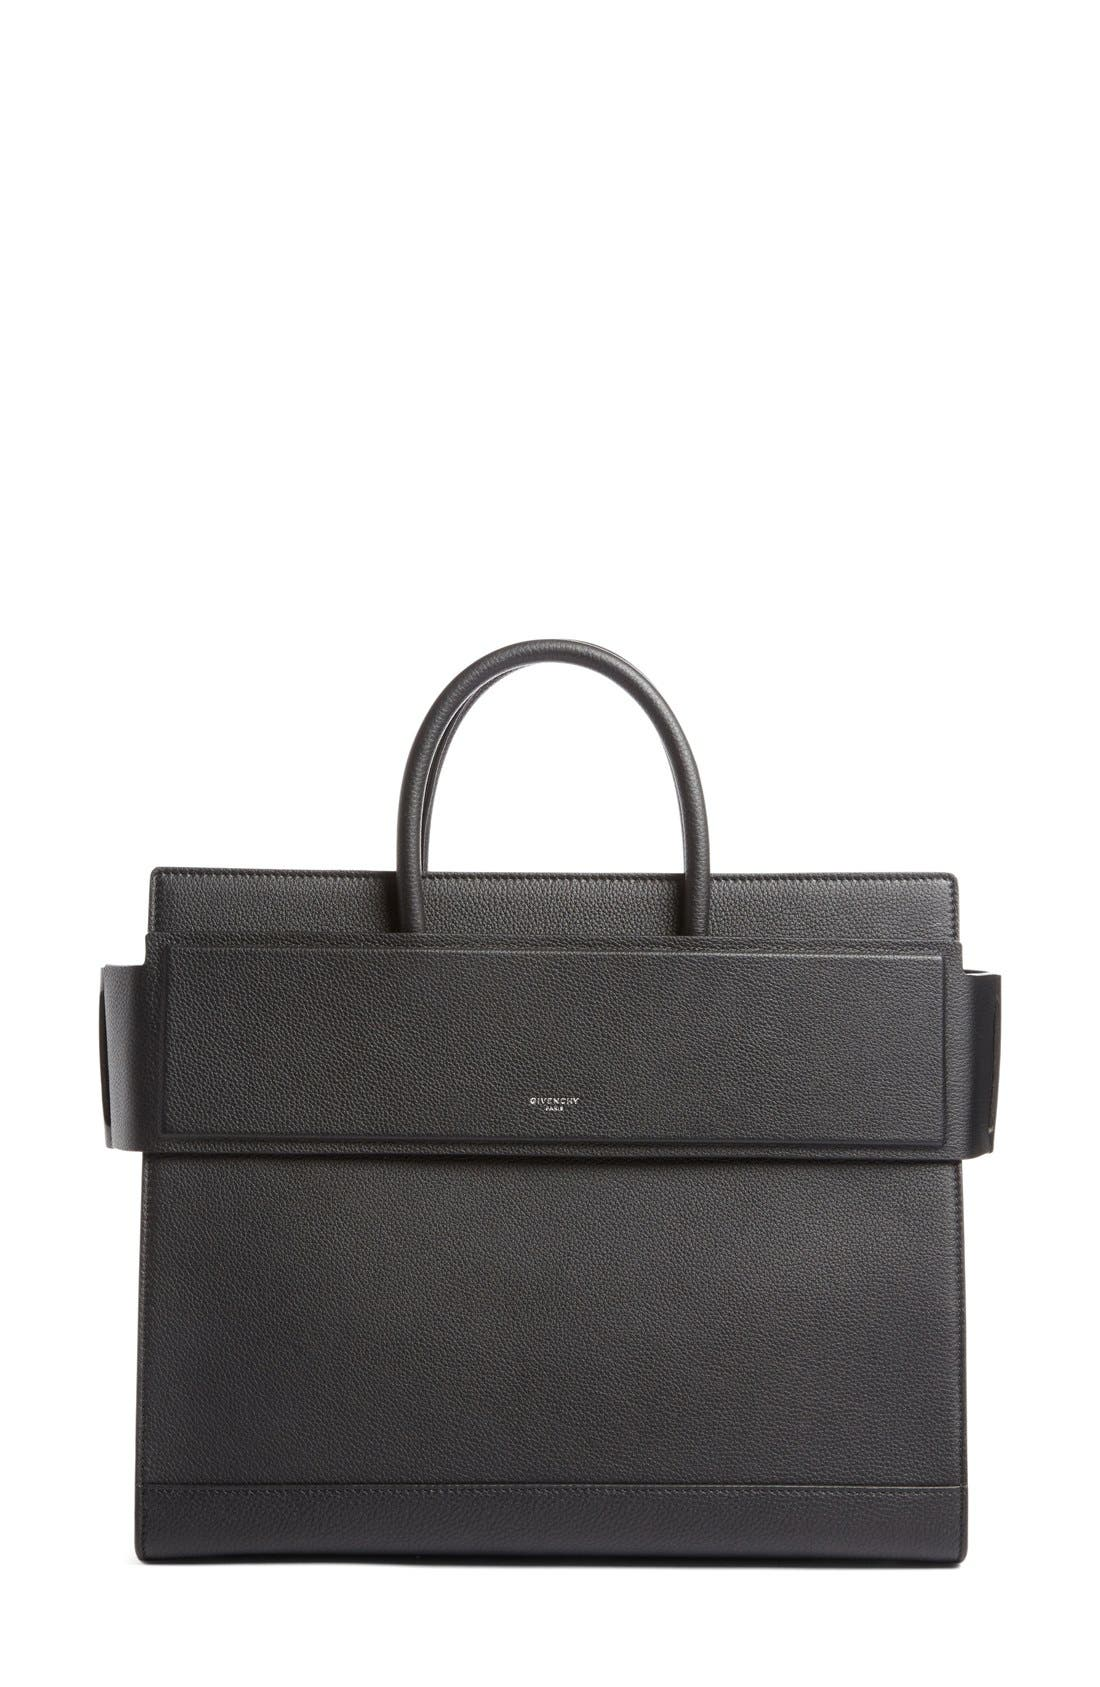 Medium Horizon Grained Calfskin Leather Tote,                             Main thumbnail 1, color,                             BLACK